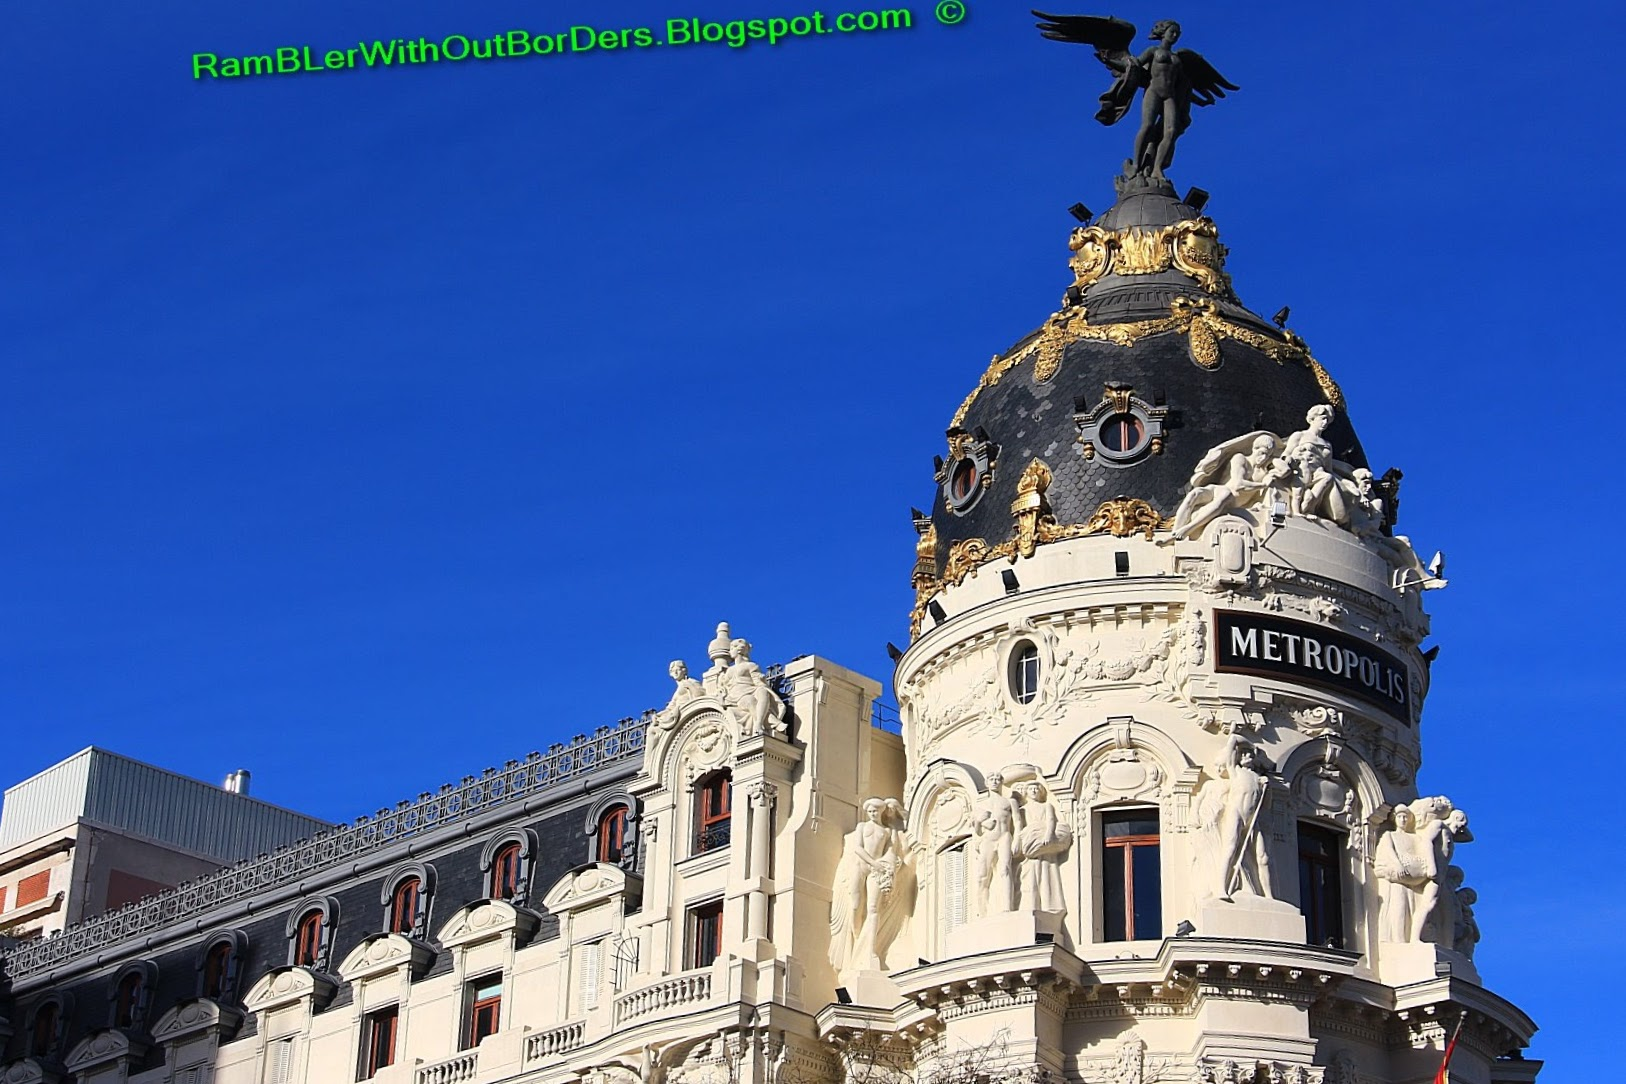 Metropolis Building, Calle de Alcala, Madrid, Spain